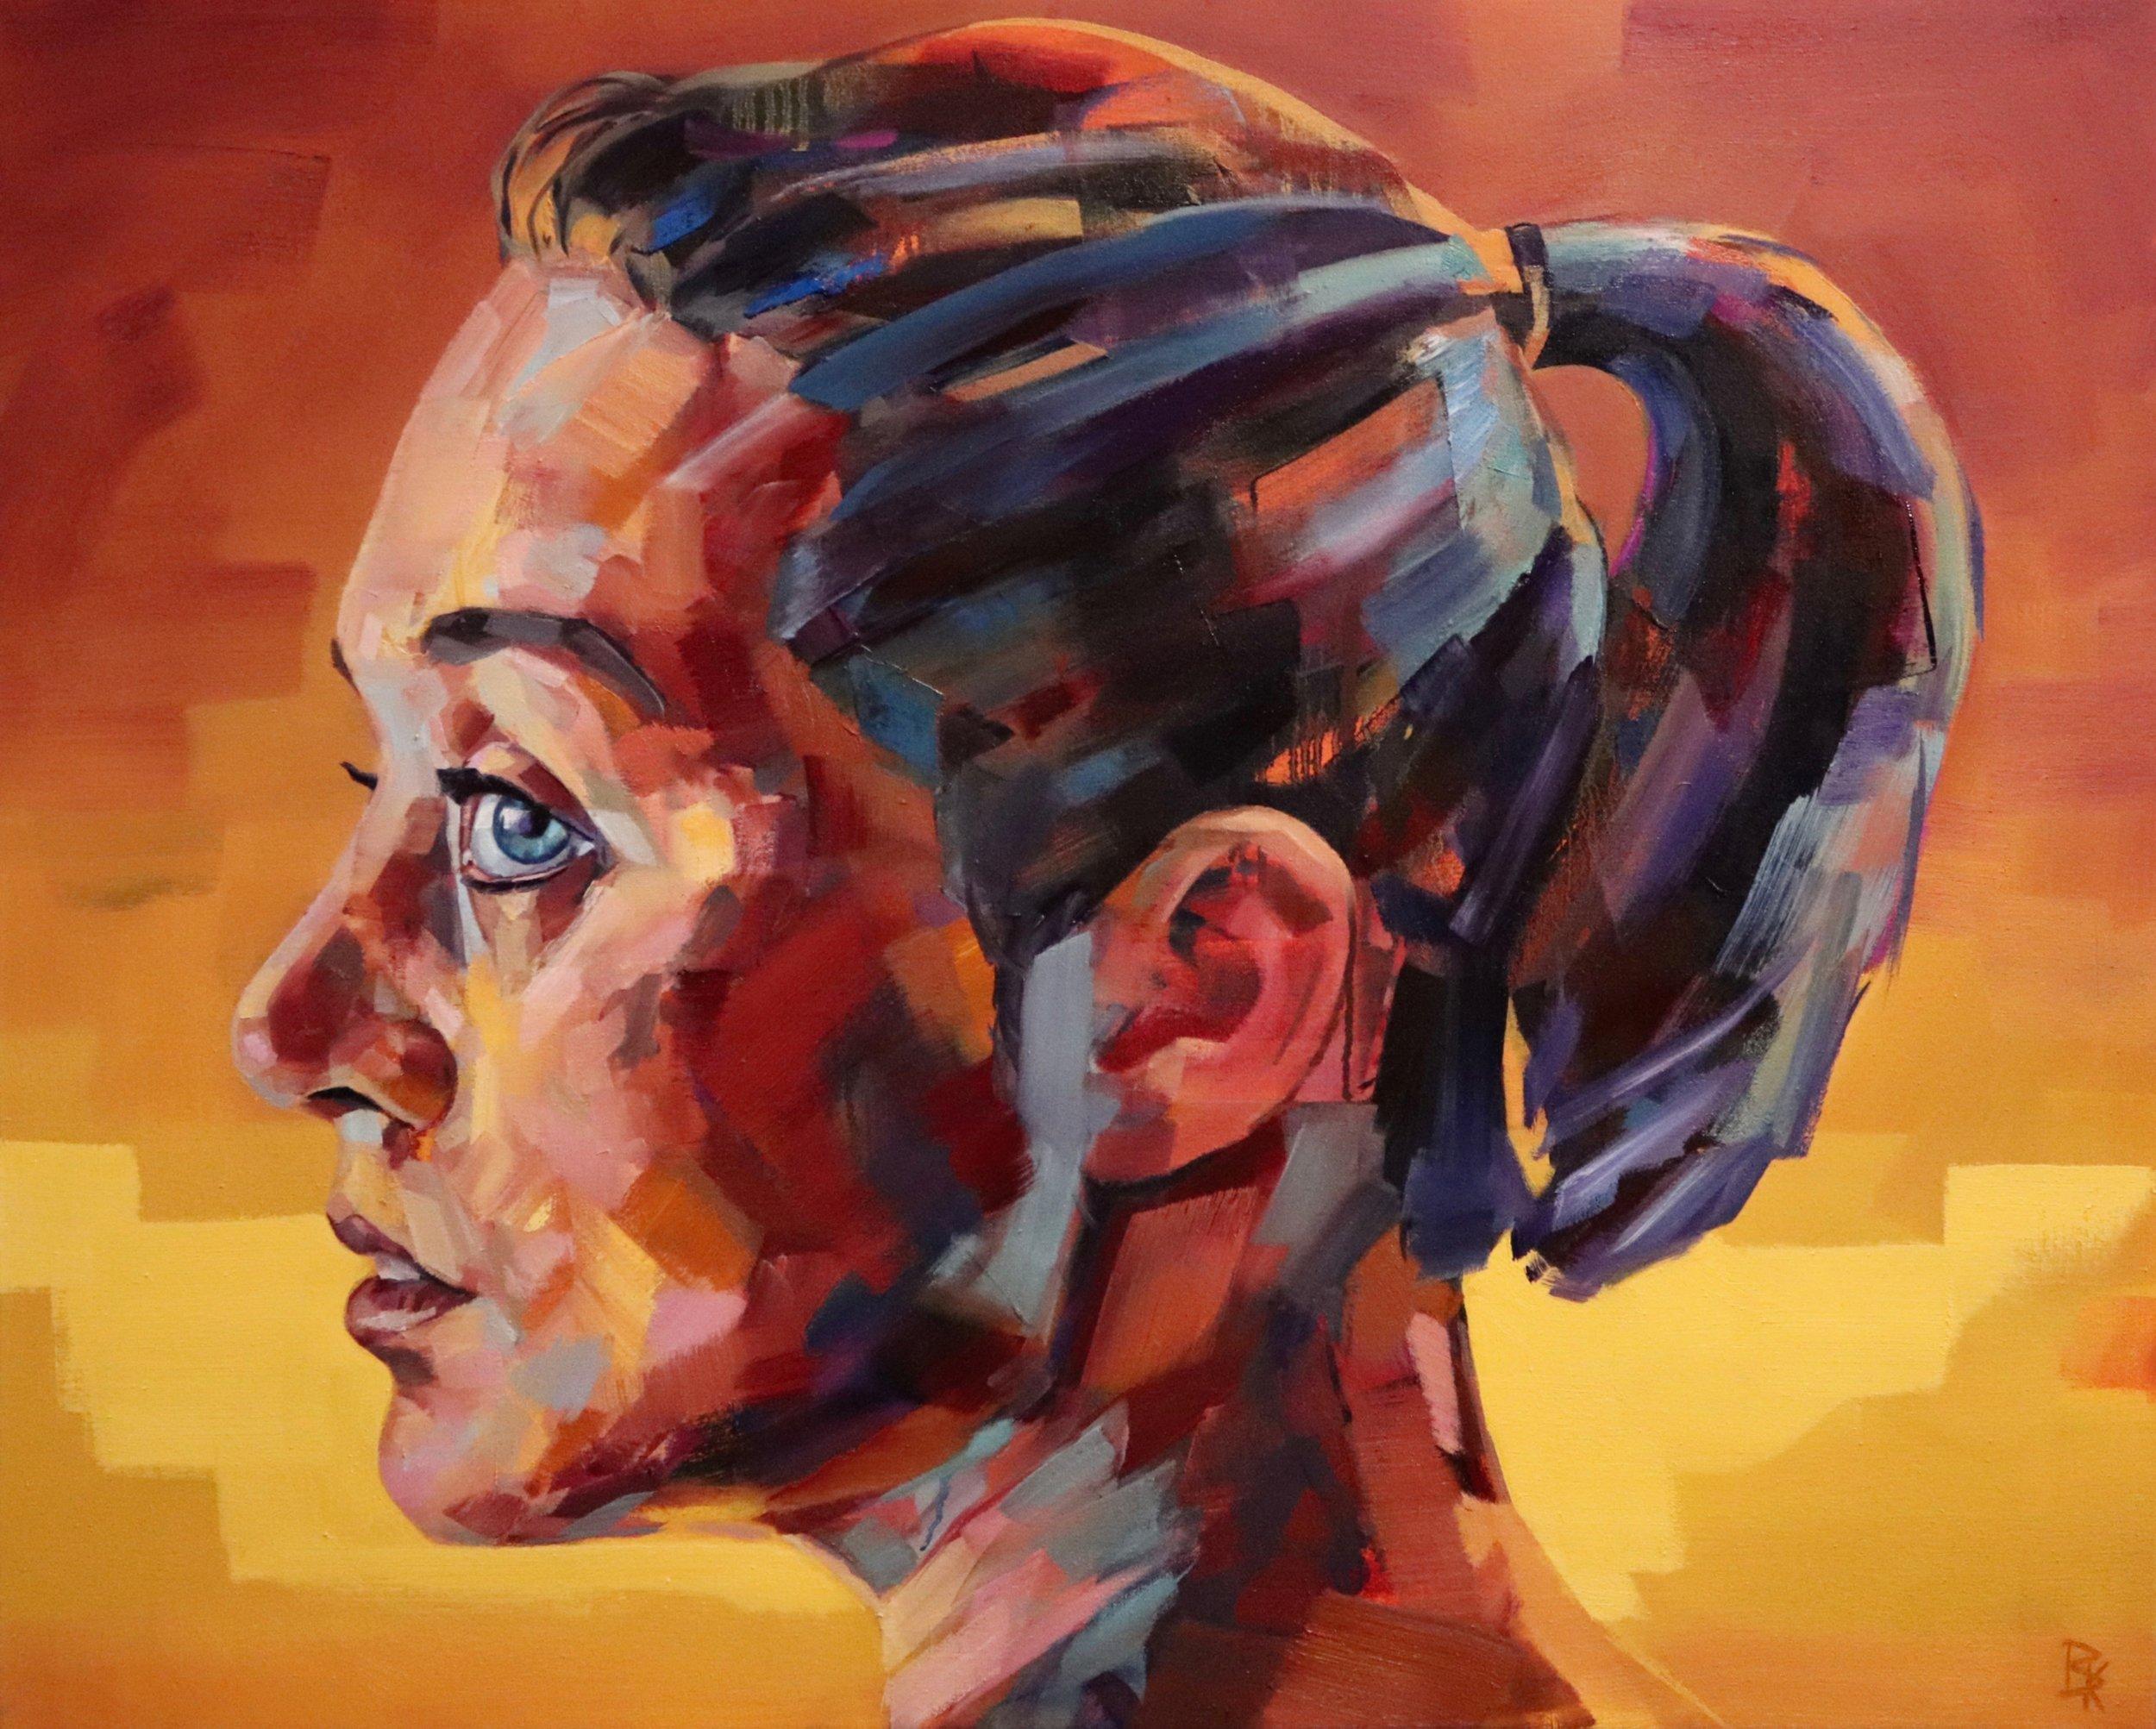 Distinct, 2018 | Oil on canvas | 80 x 100 cm | £1,800